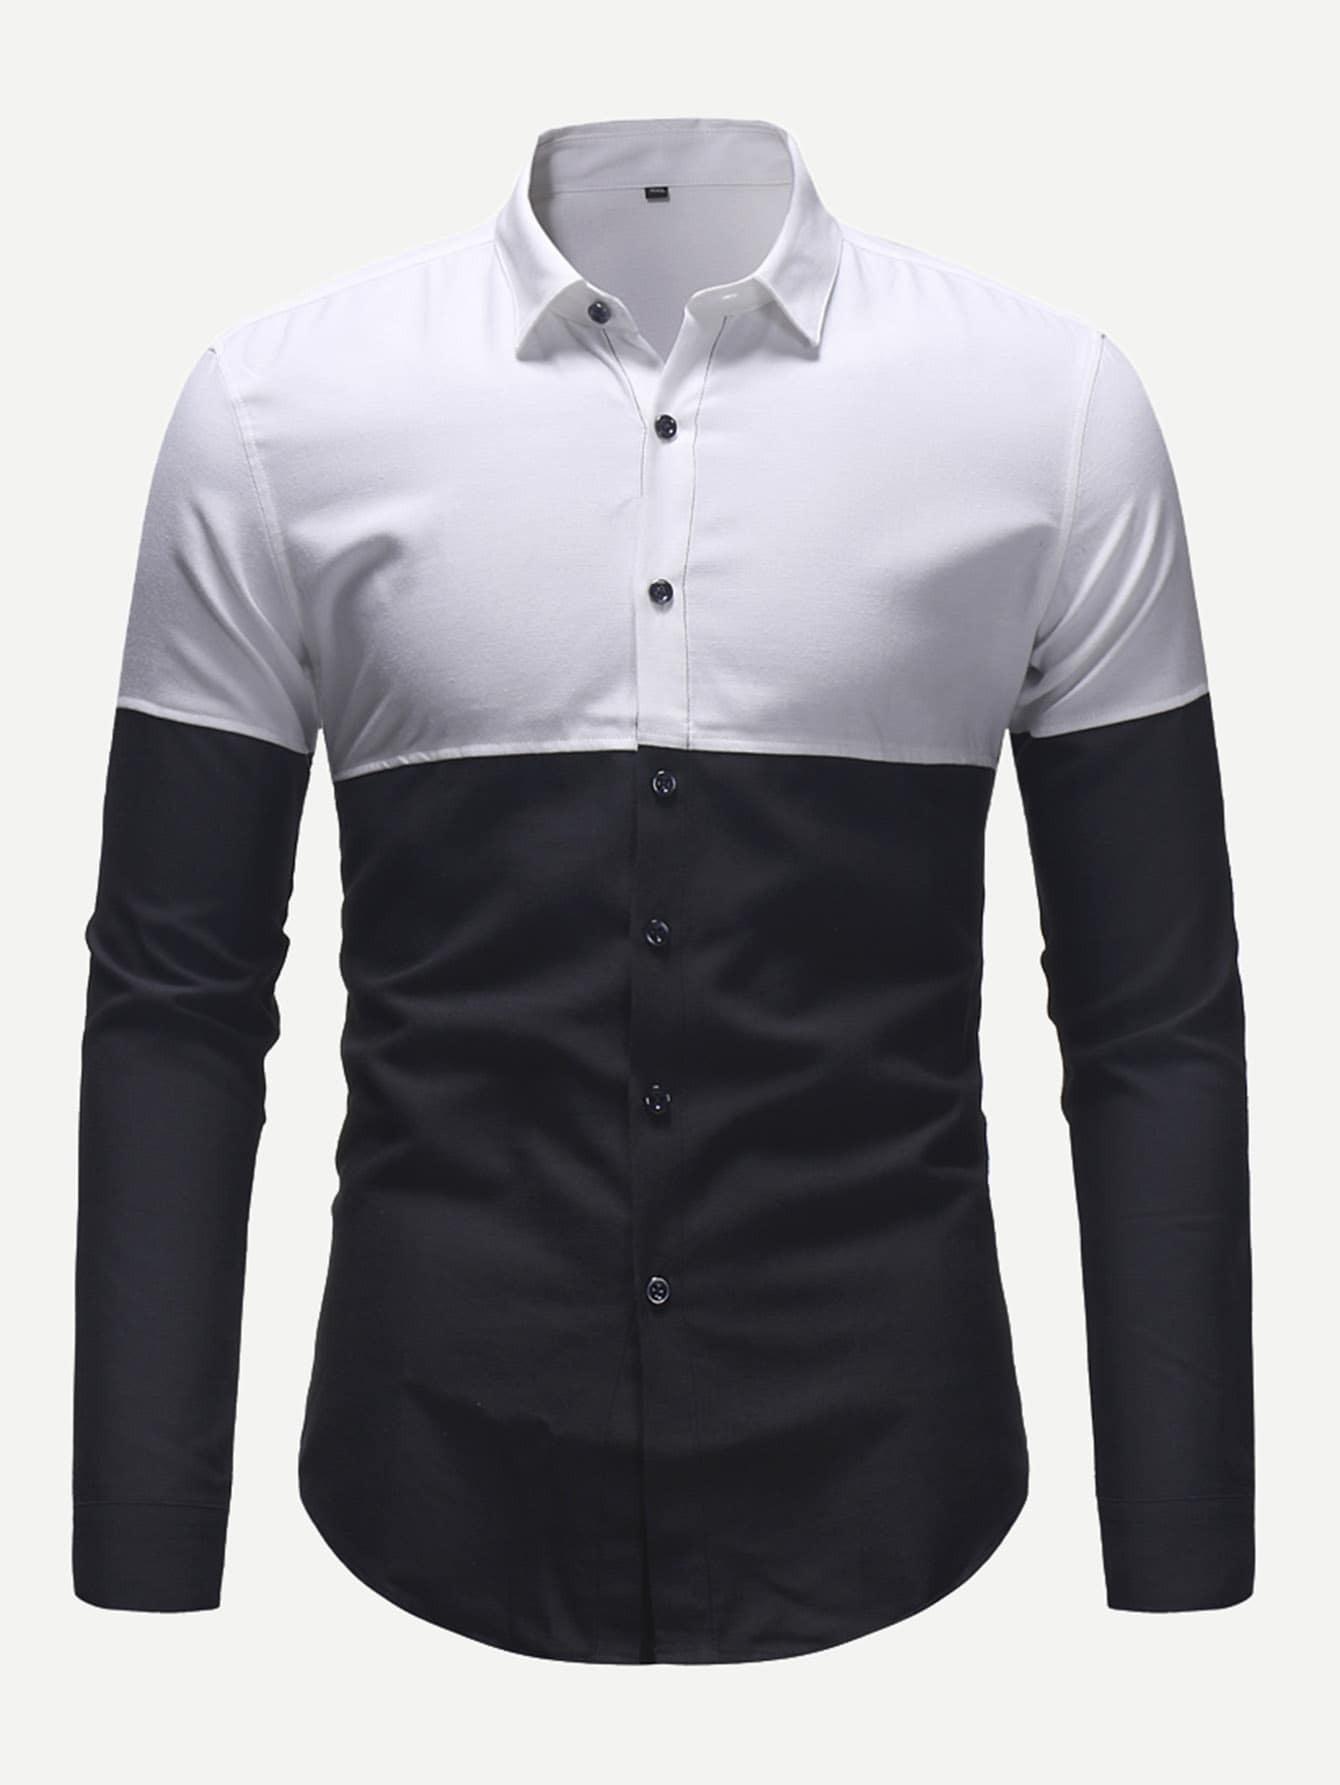 Men Cut And Sew Shirt Men Cut And Sew Shirt